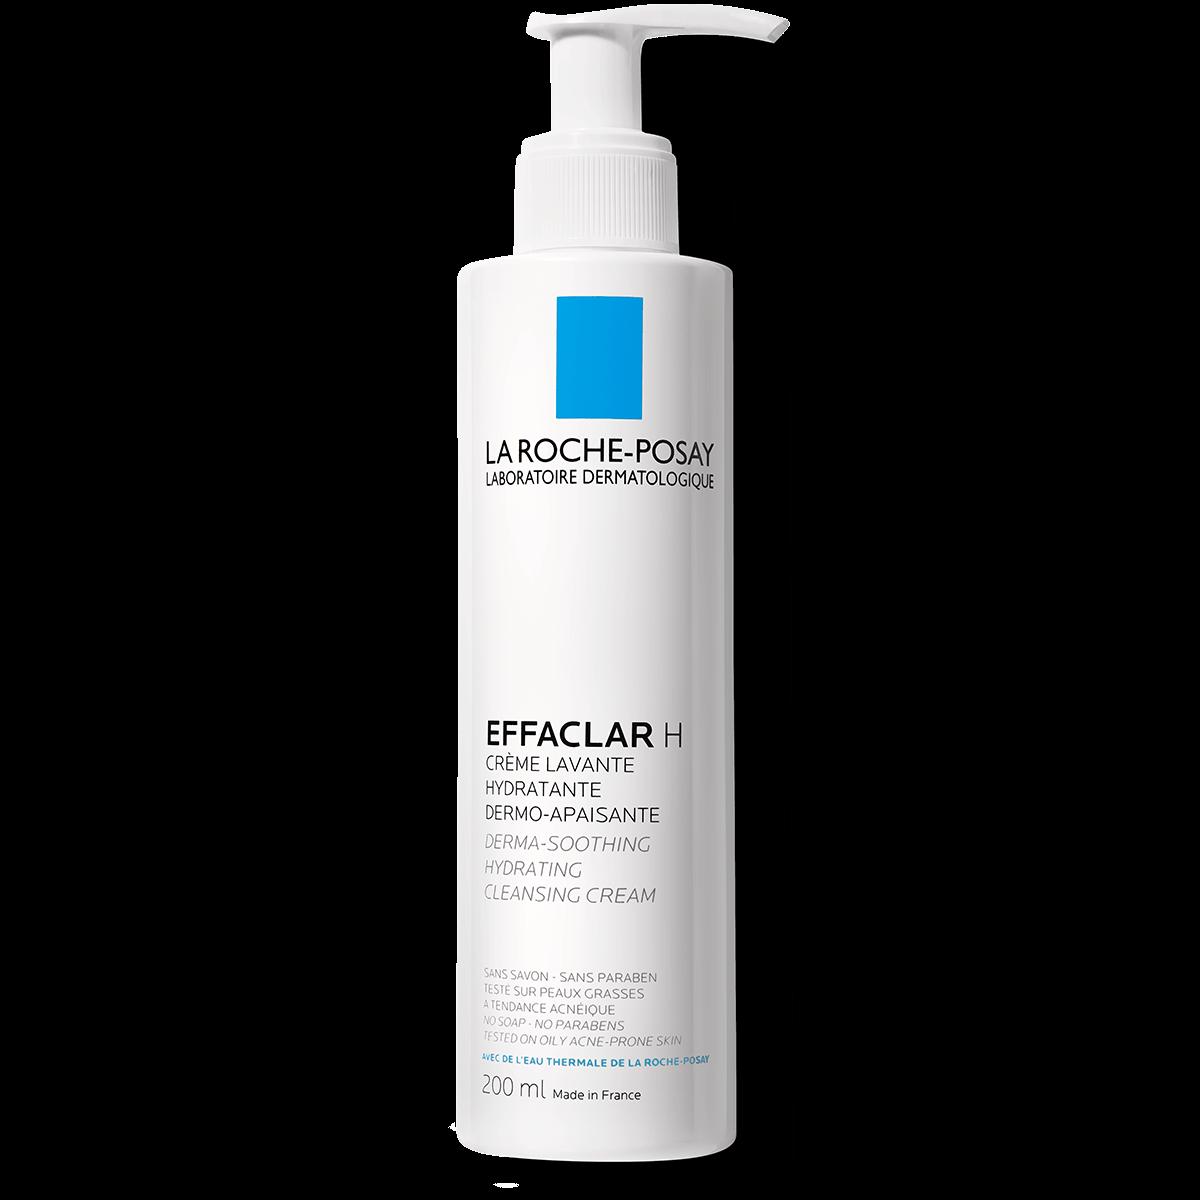 La Roche Posay Kasvojen puhdistustuote Effaclar H Cleansing Cream 200ml 33378753